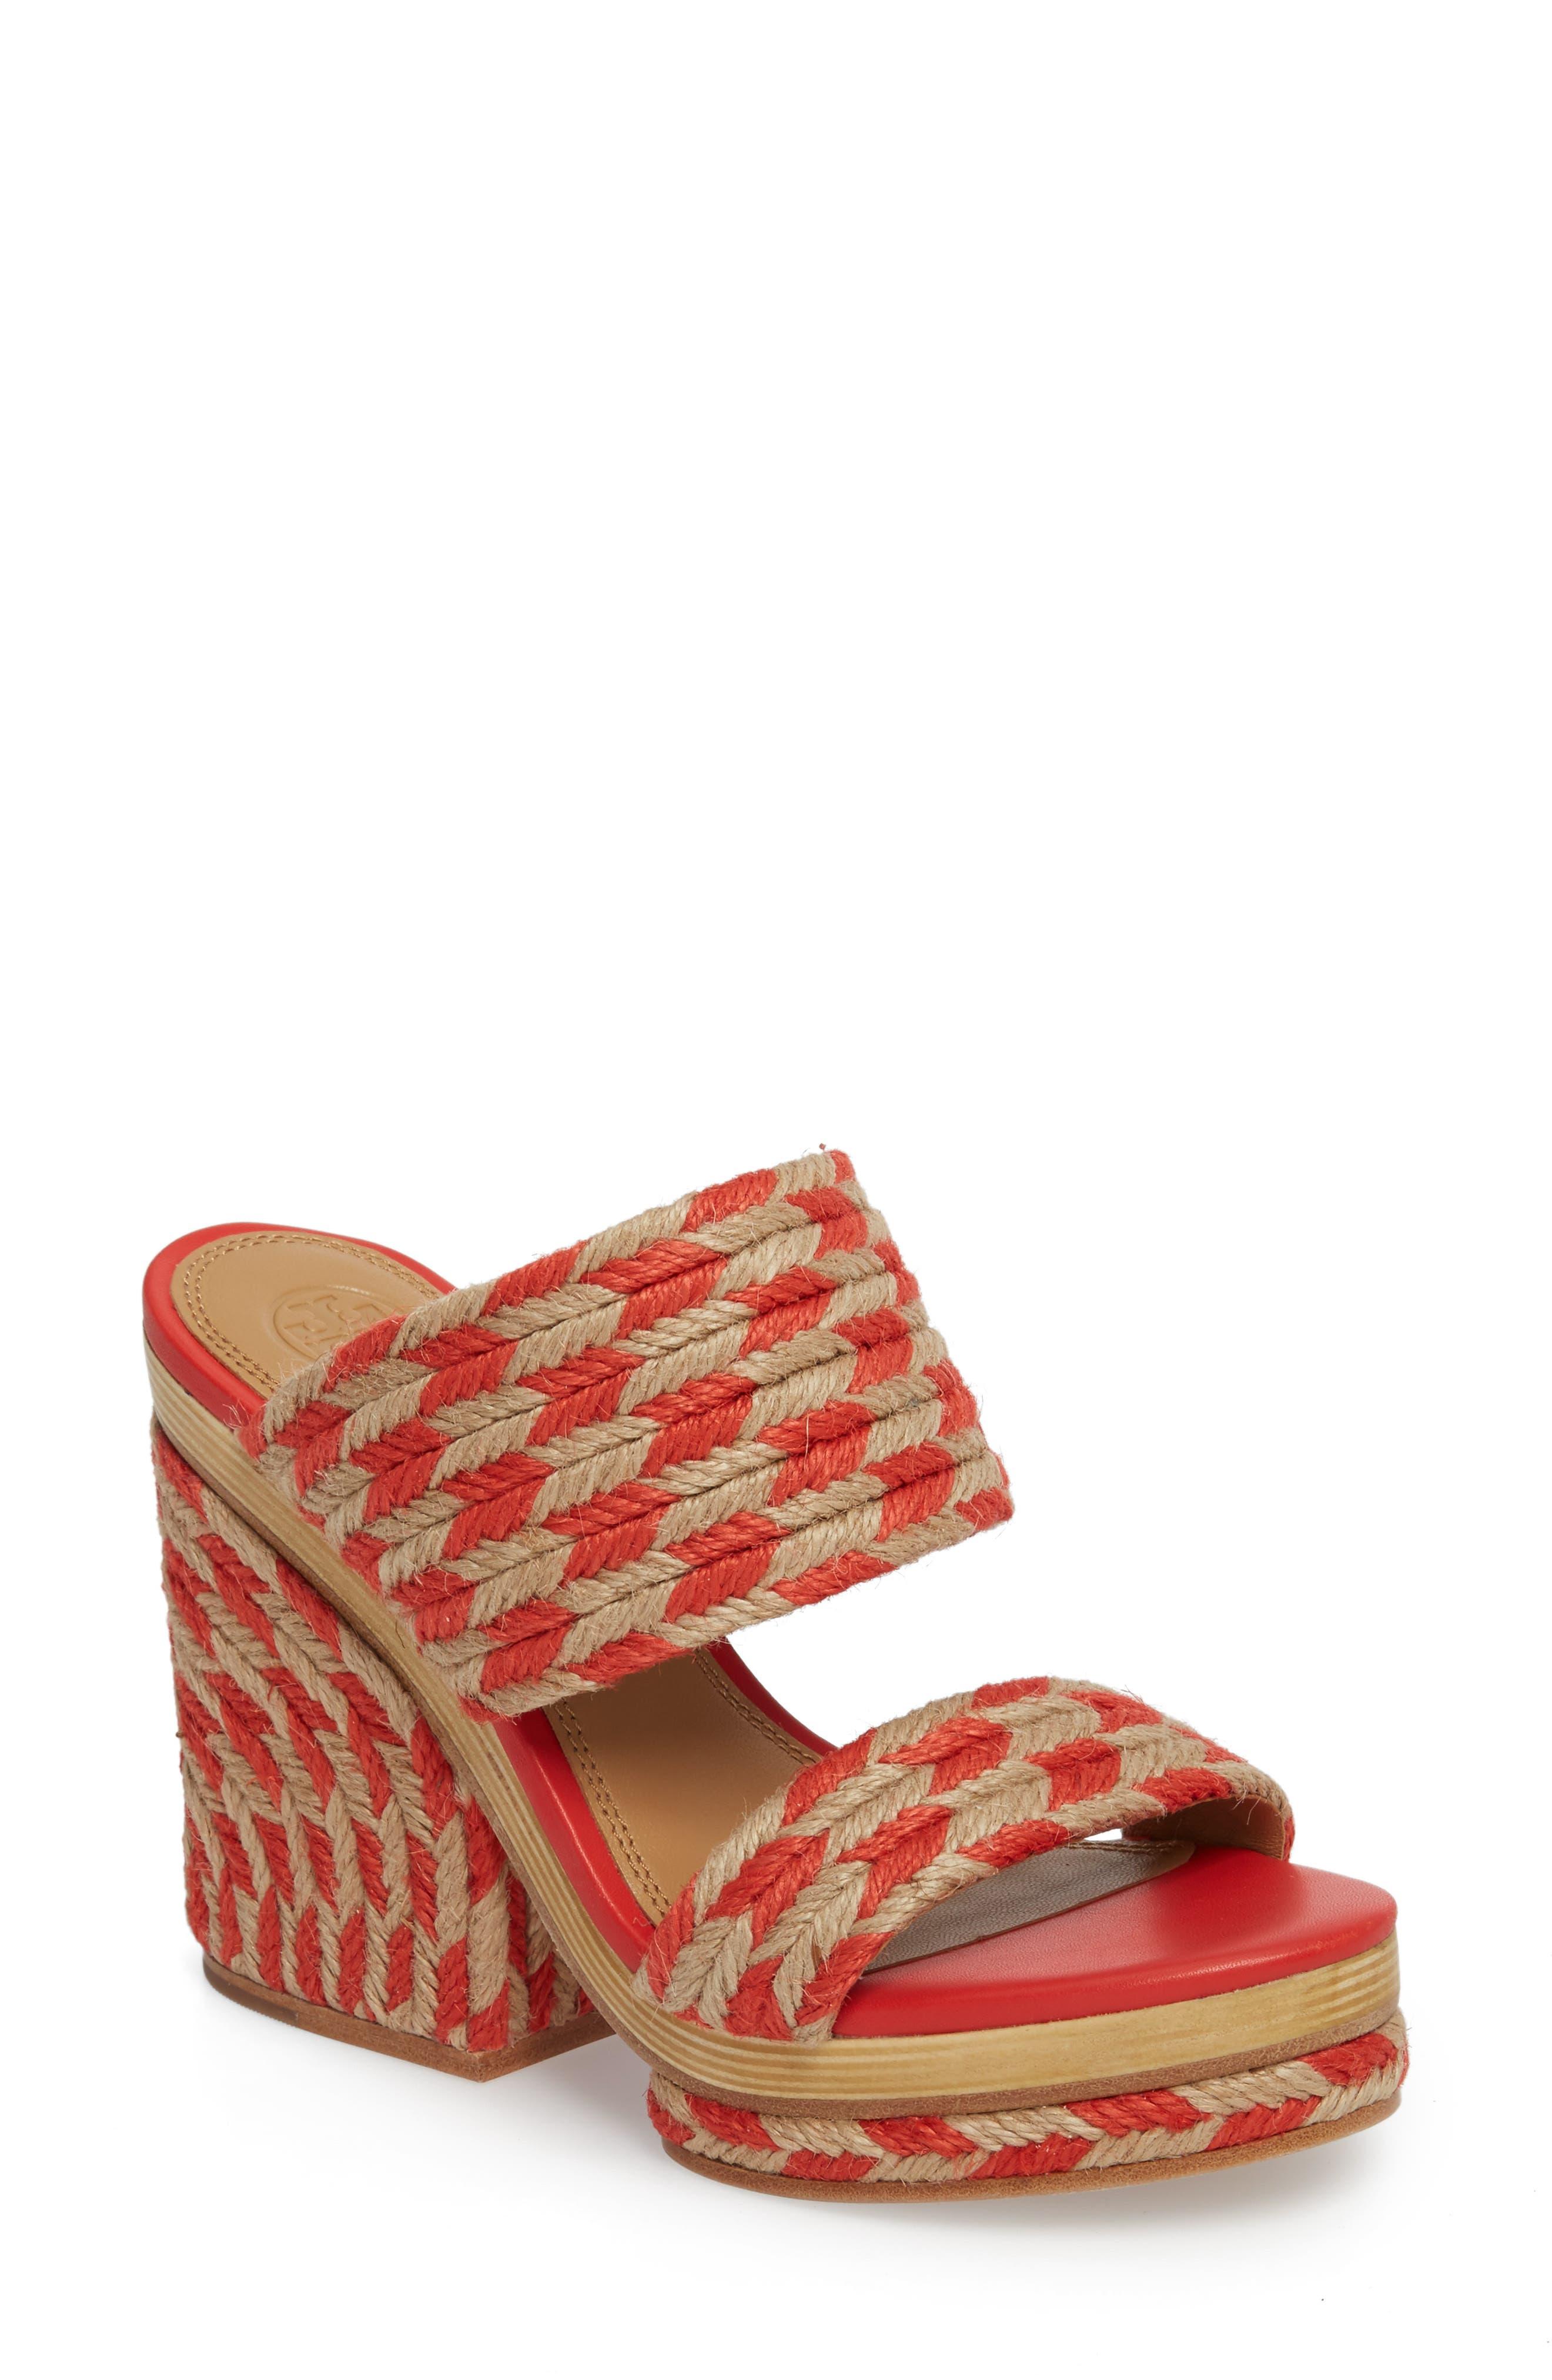 Lola Woven Platform Sandal,                         Main,                         color, Poppy Orange/ Perfect Ivory